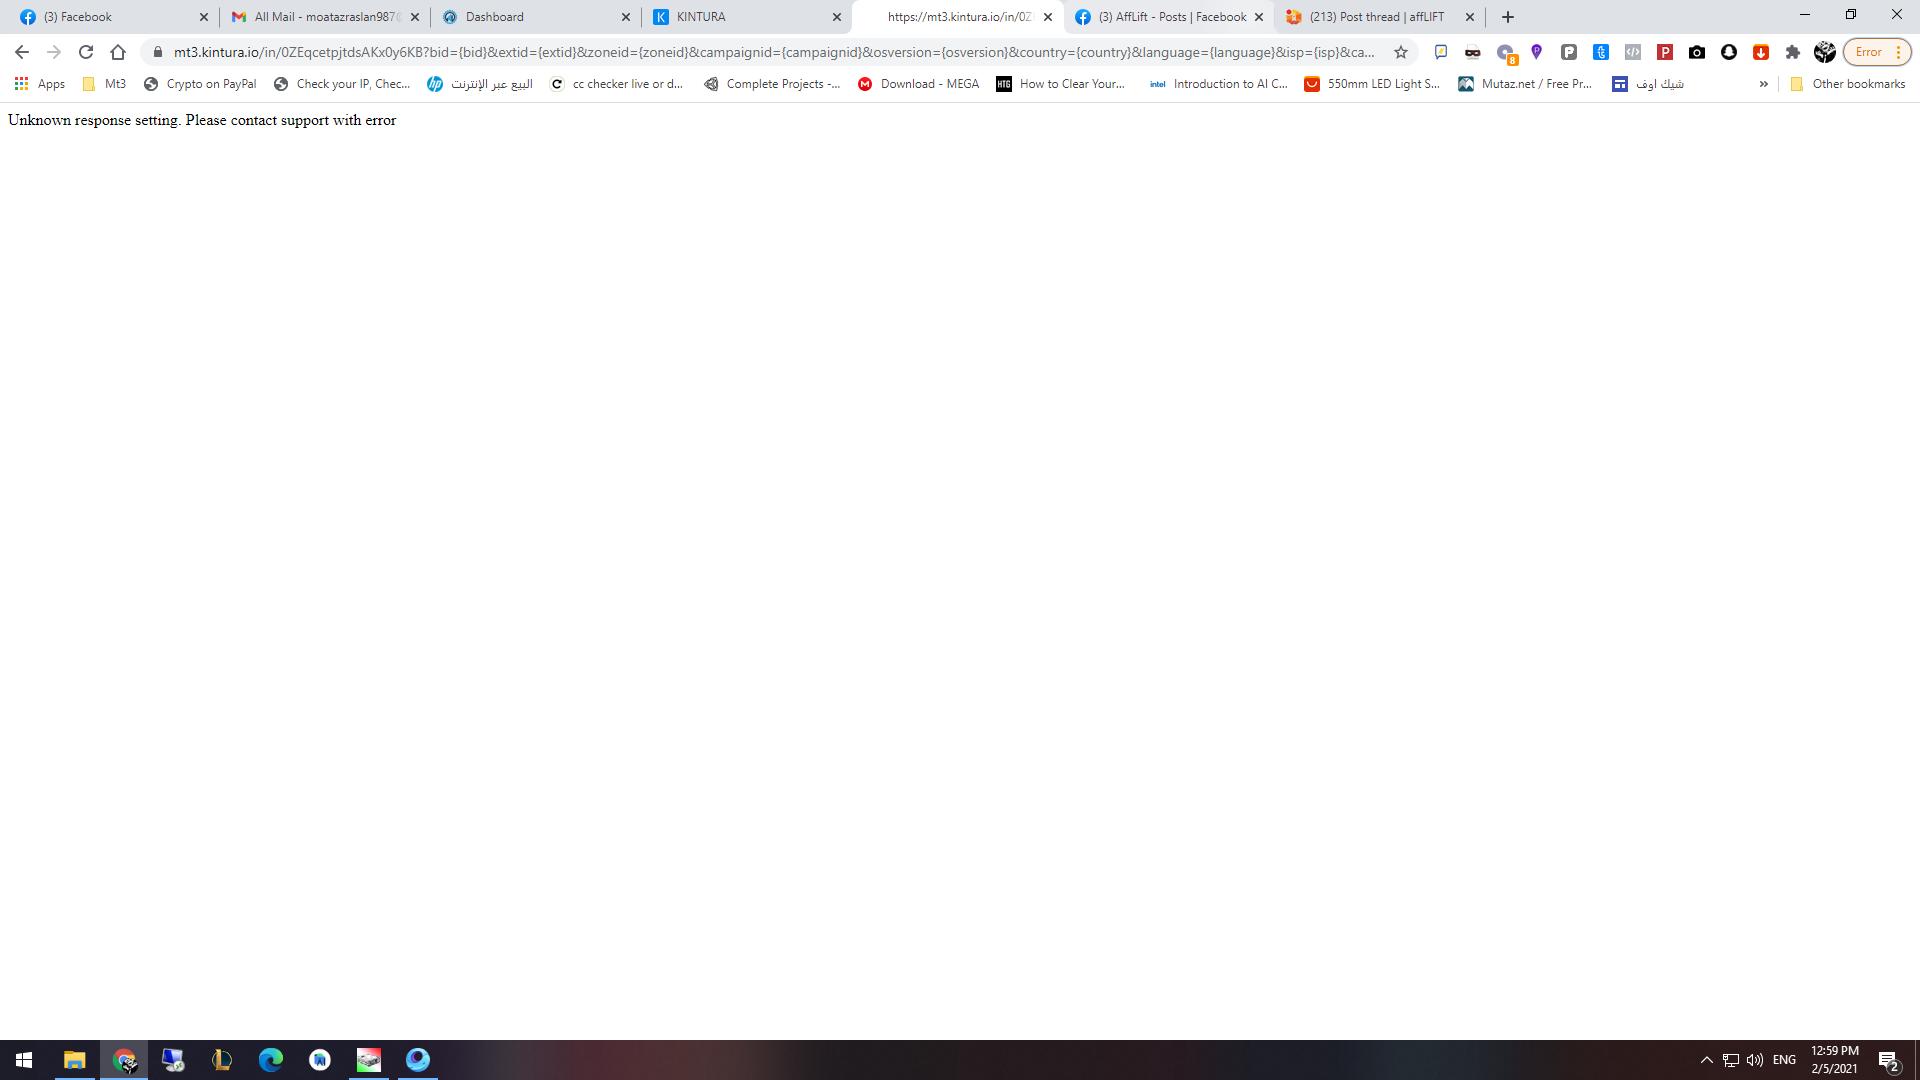 desktop-screenshot-2021-02-05-12-59-59-94-png.16484